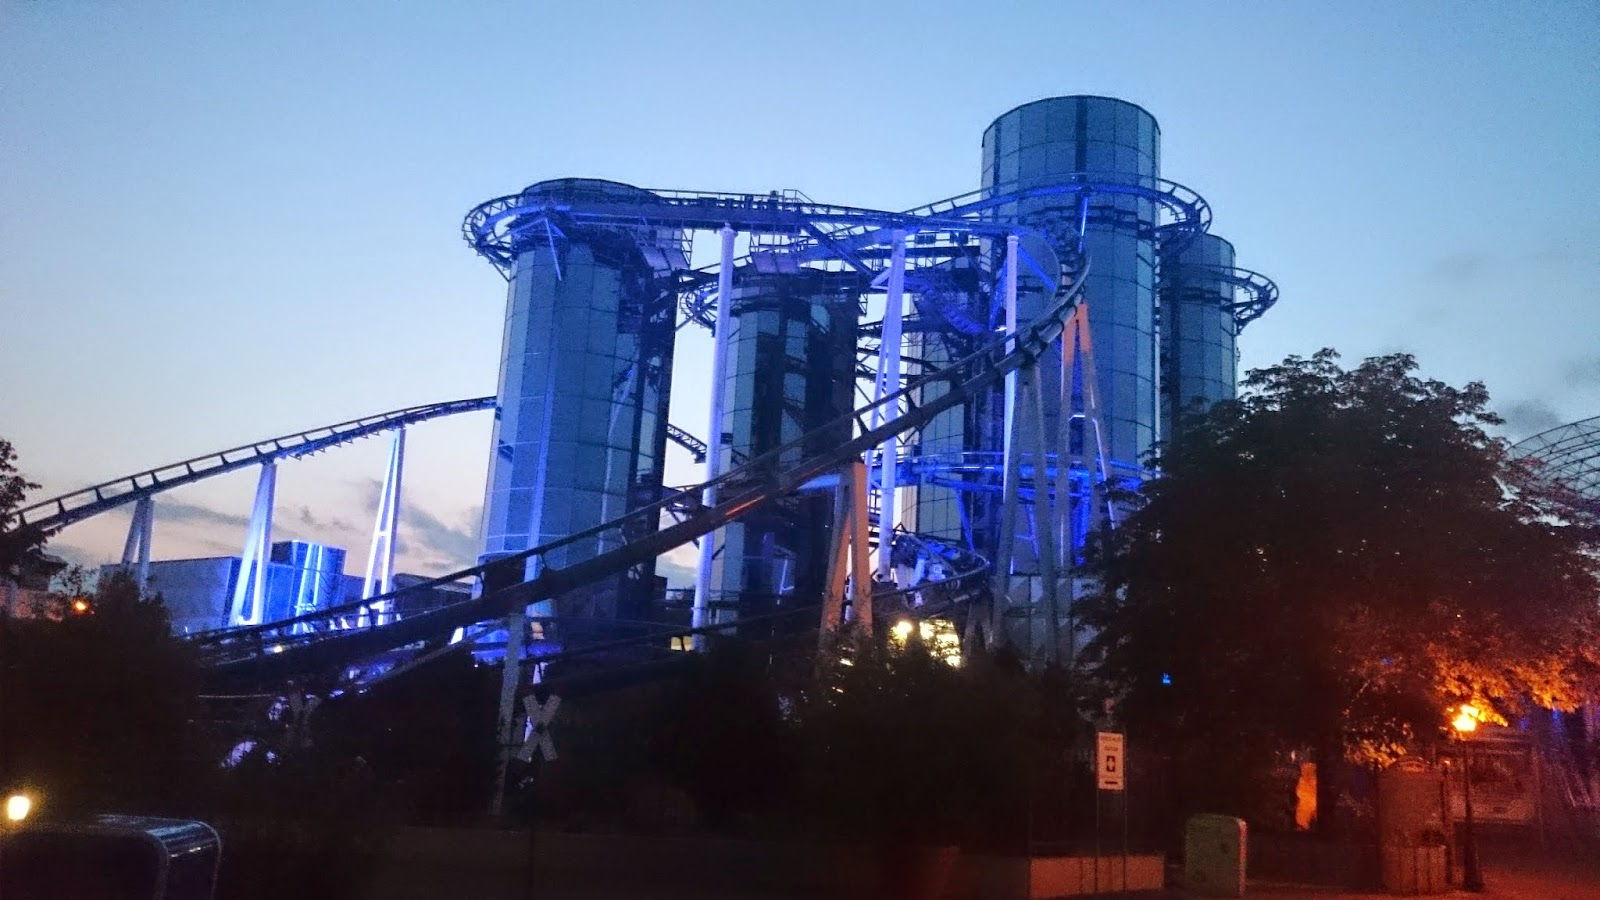 eurosat,silver,bluefire,europa park,obiekt,design,szklany budynek,zabawa